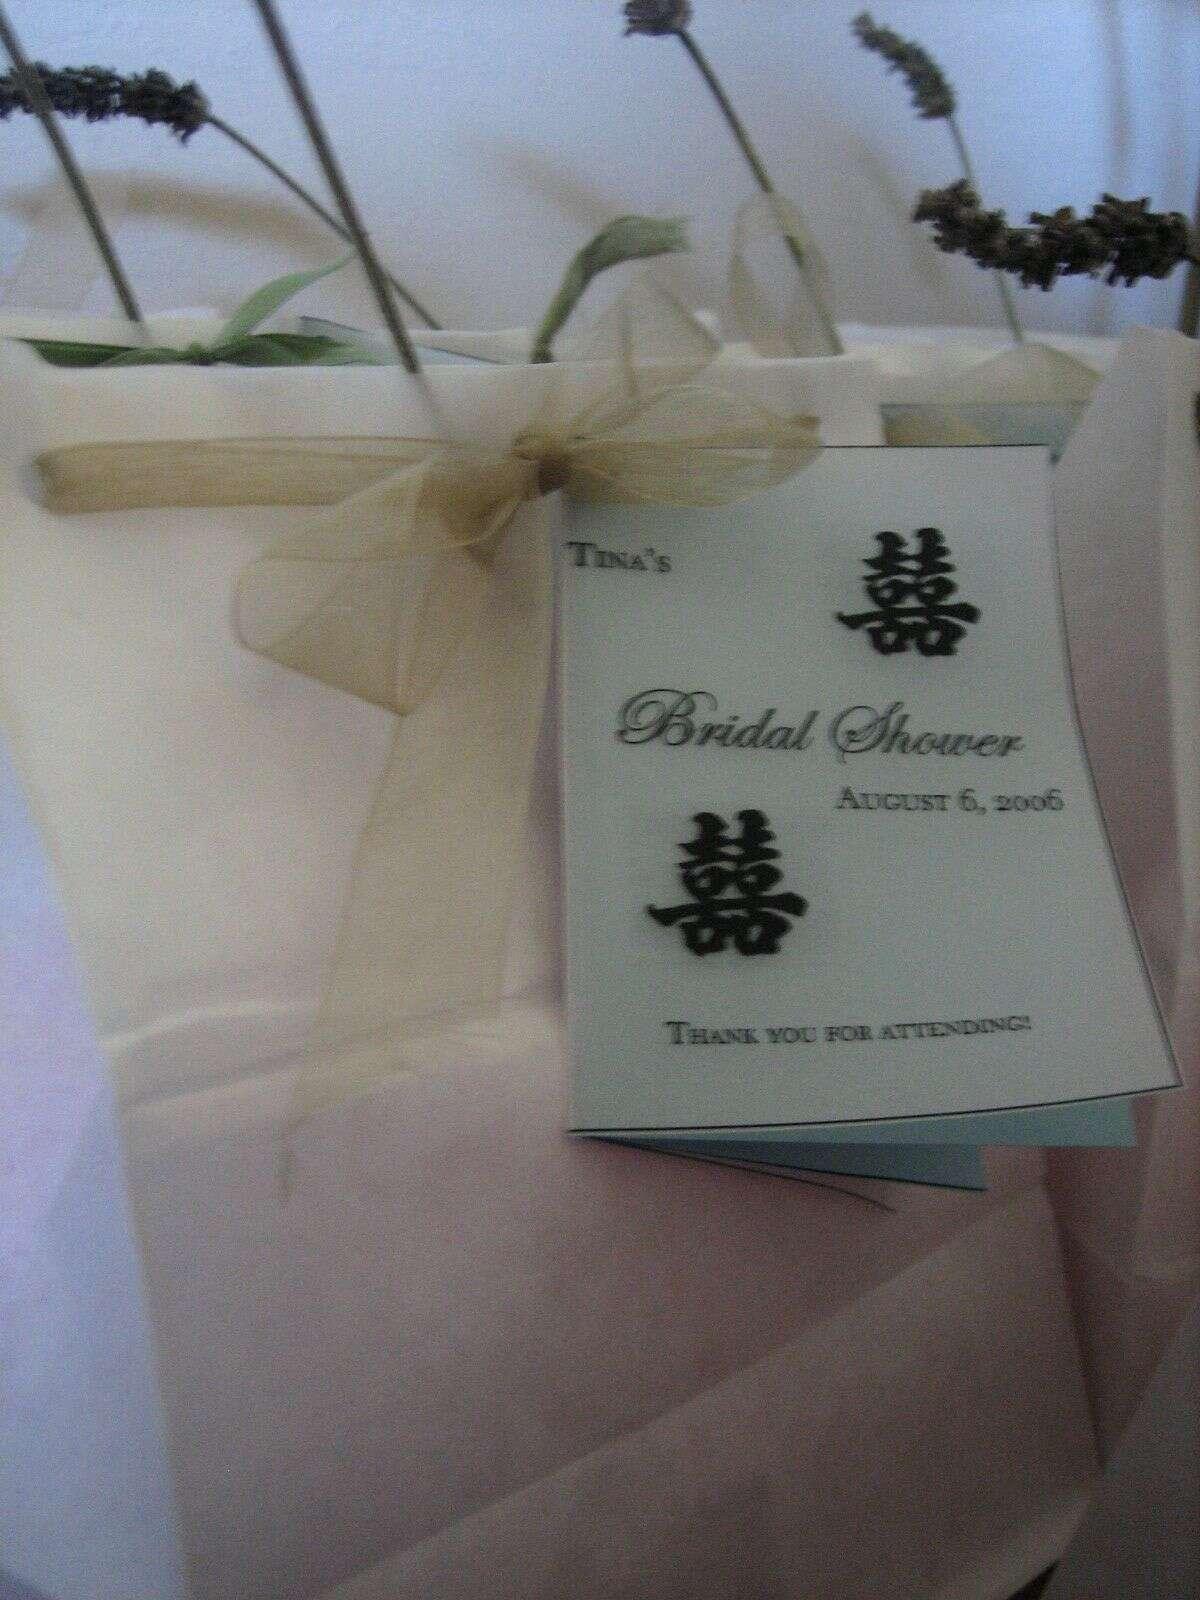 Bridal Shower vs. Engagement Party?